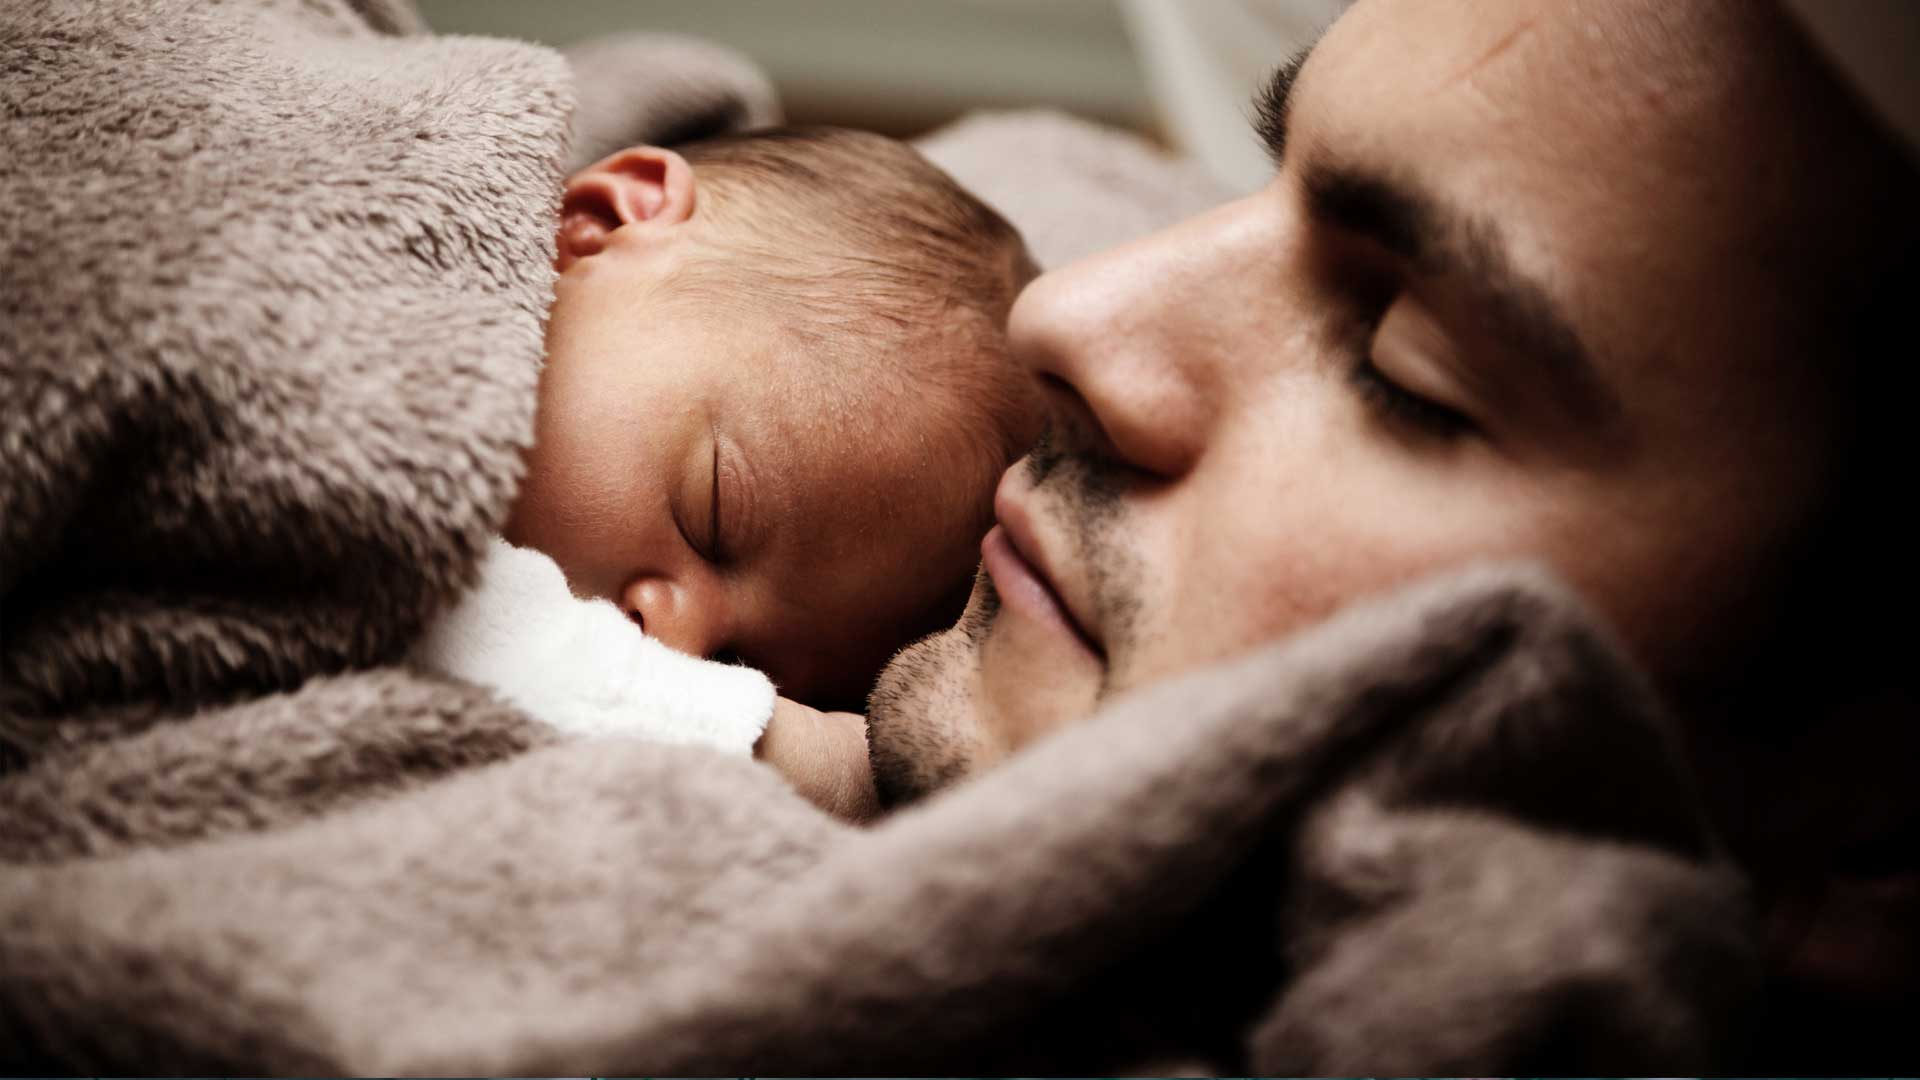 WellMama - Fatherhood Depression